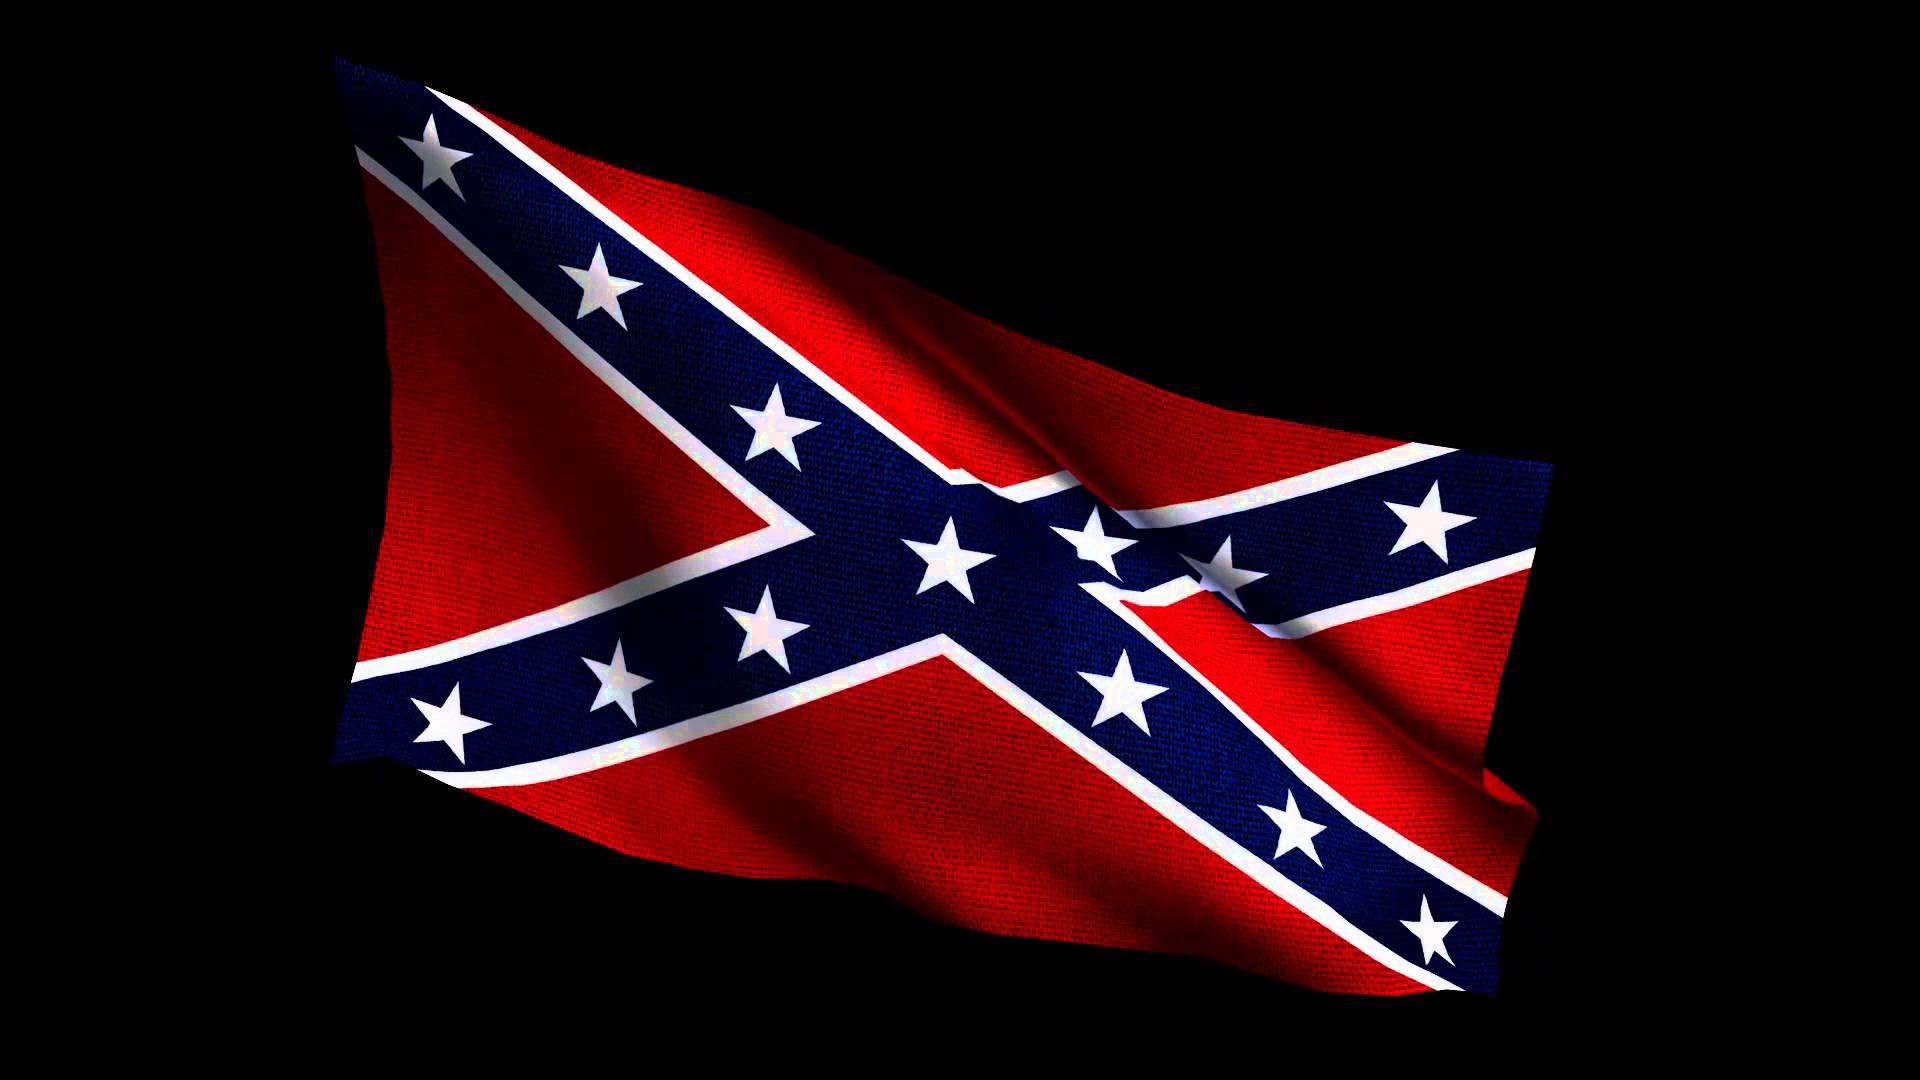 50+] Animated Confederate Flag Wallpaper on WallpaperSafari.